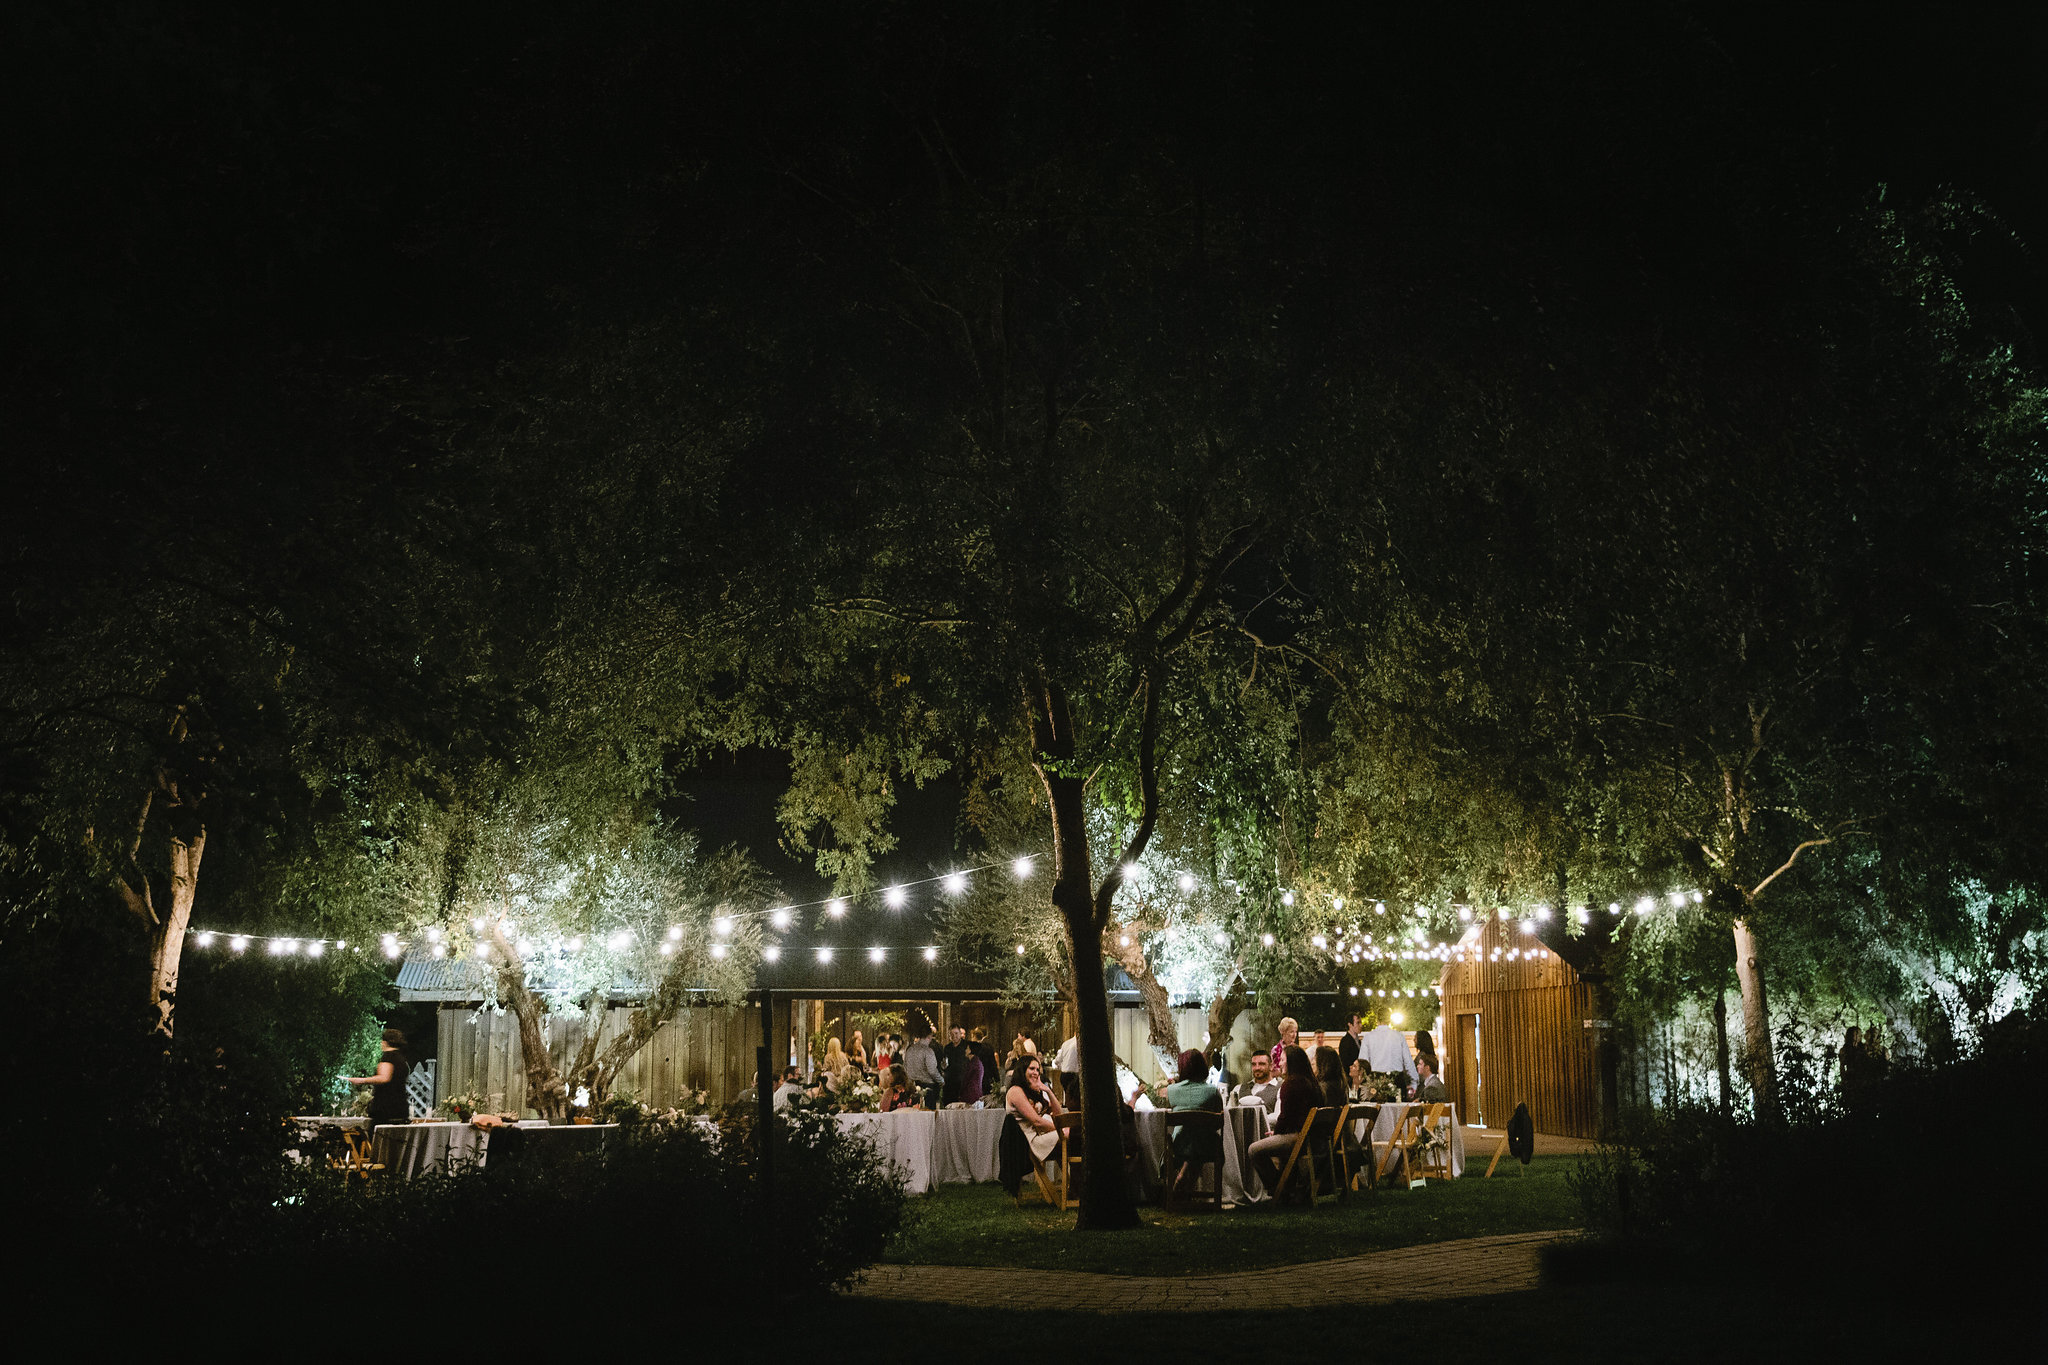 Healdsburg-Rus-Farm-Garden-Wedding-85.JPG